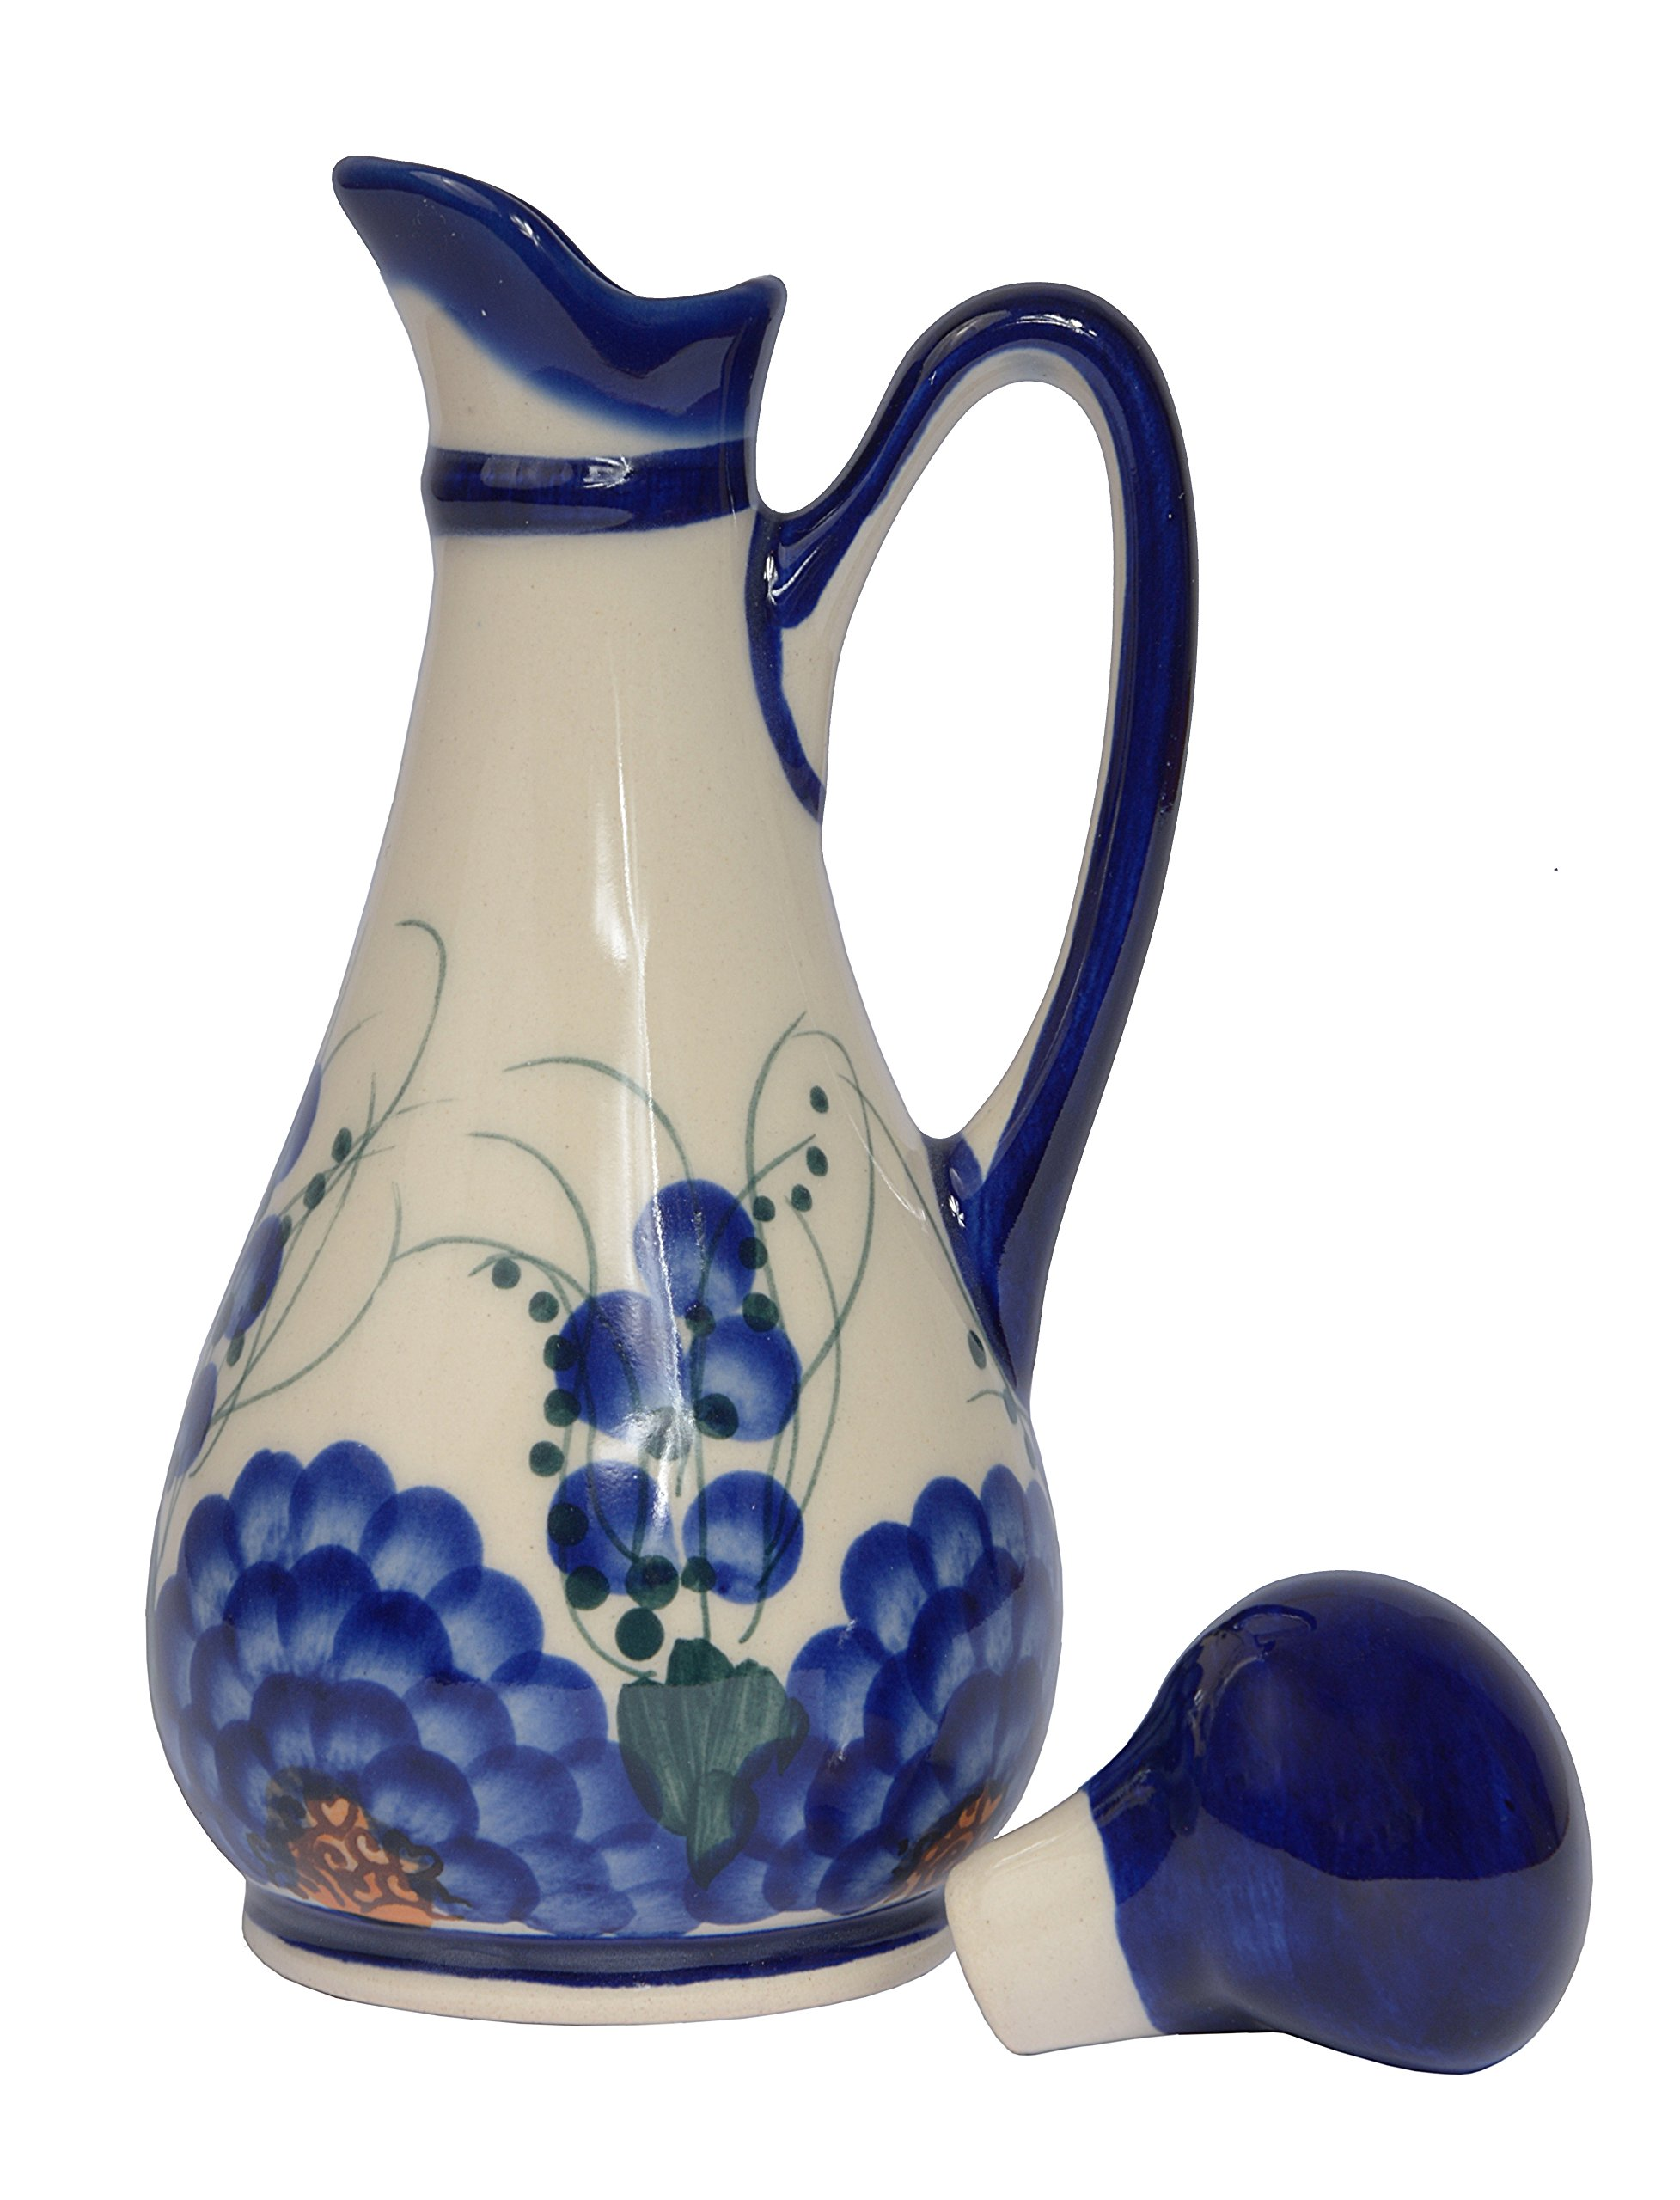 Traditional Polish Pottery, Handcrafted Ceramic Olive Oil or Vinegar Bottle 160ml, Boleslawiec Style Pattern, V.401.Arts